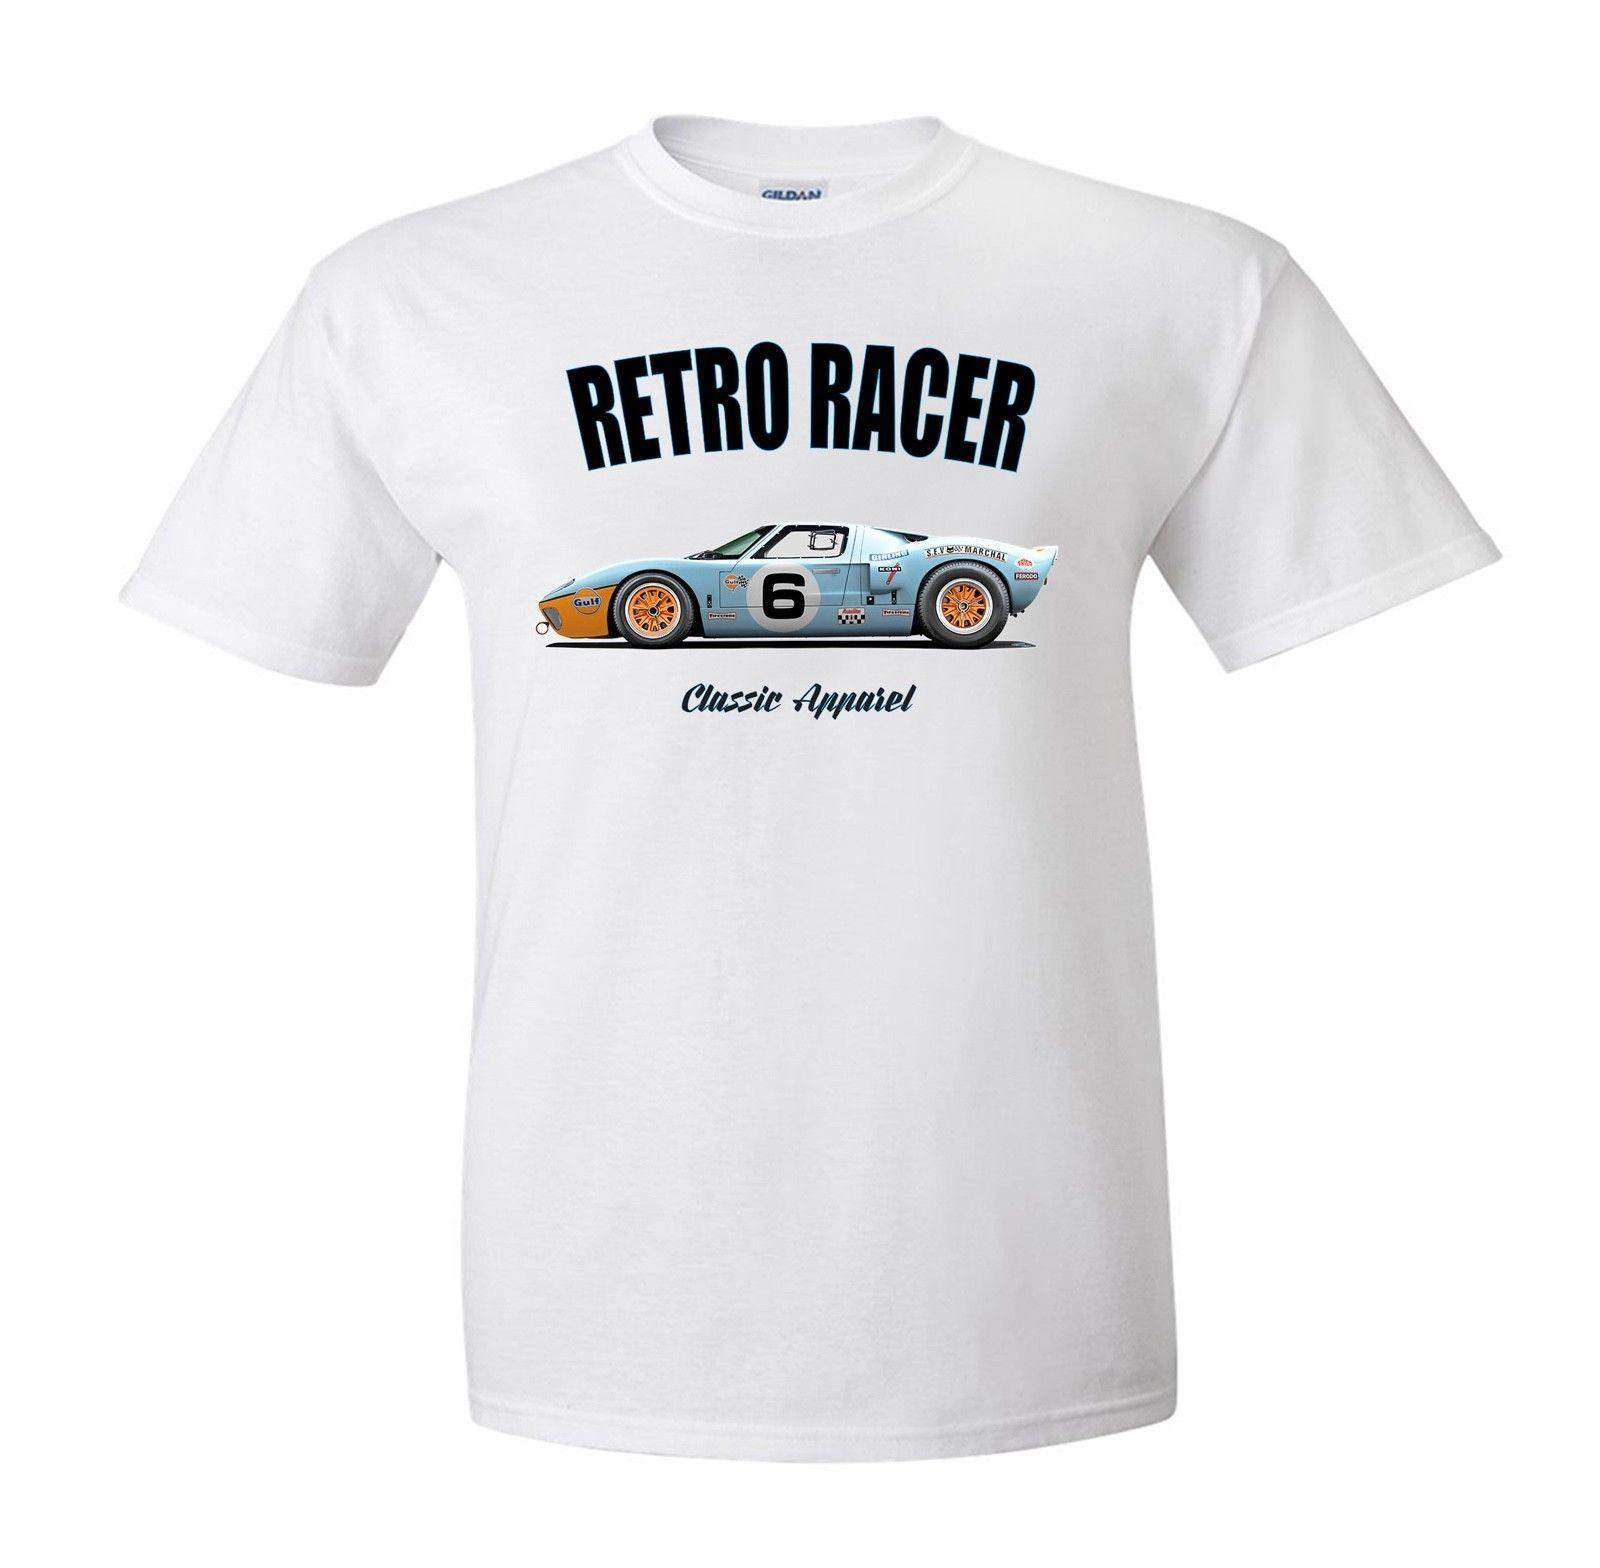 Ford Gt T Shirt Retro Racer Classic Car Race Car Gt  Buy Tshirts The Who T Shirts From Xsytshirt   Dhgate Com